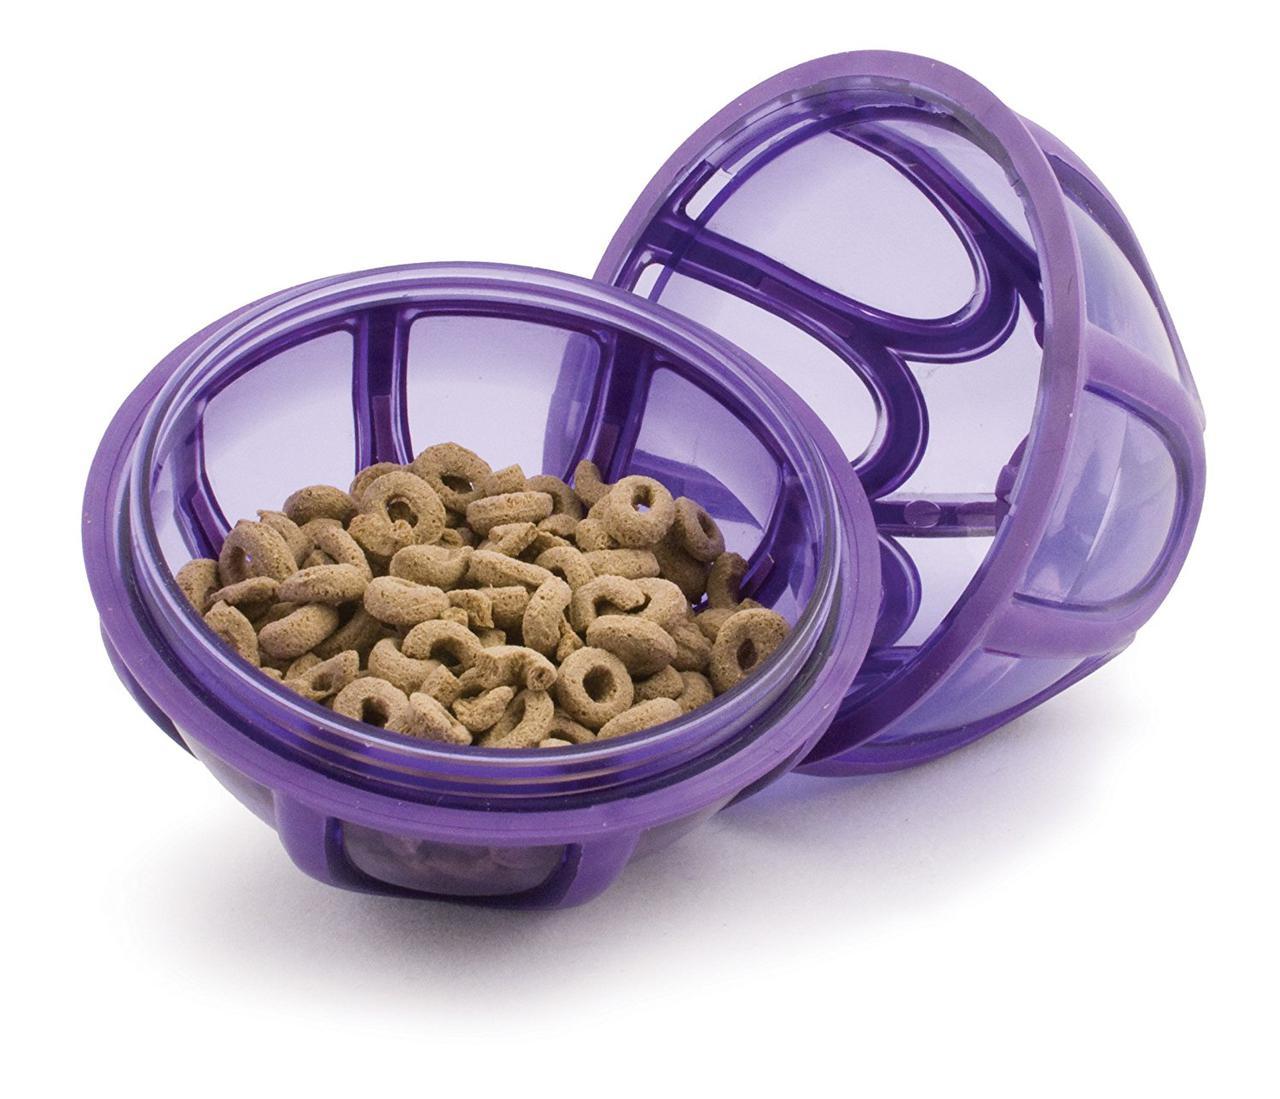 Croci C6066982 Petsafe Gioco Cane  кормушка - шар для щенков 5,8 см